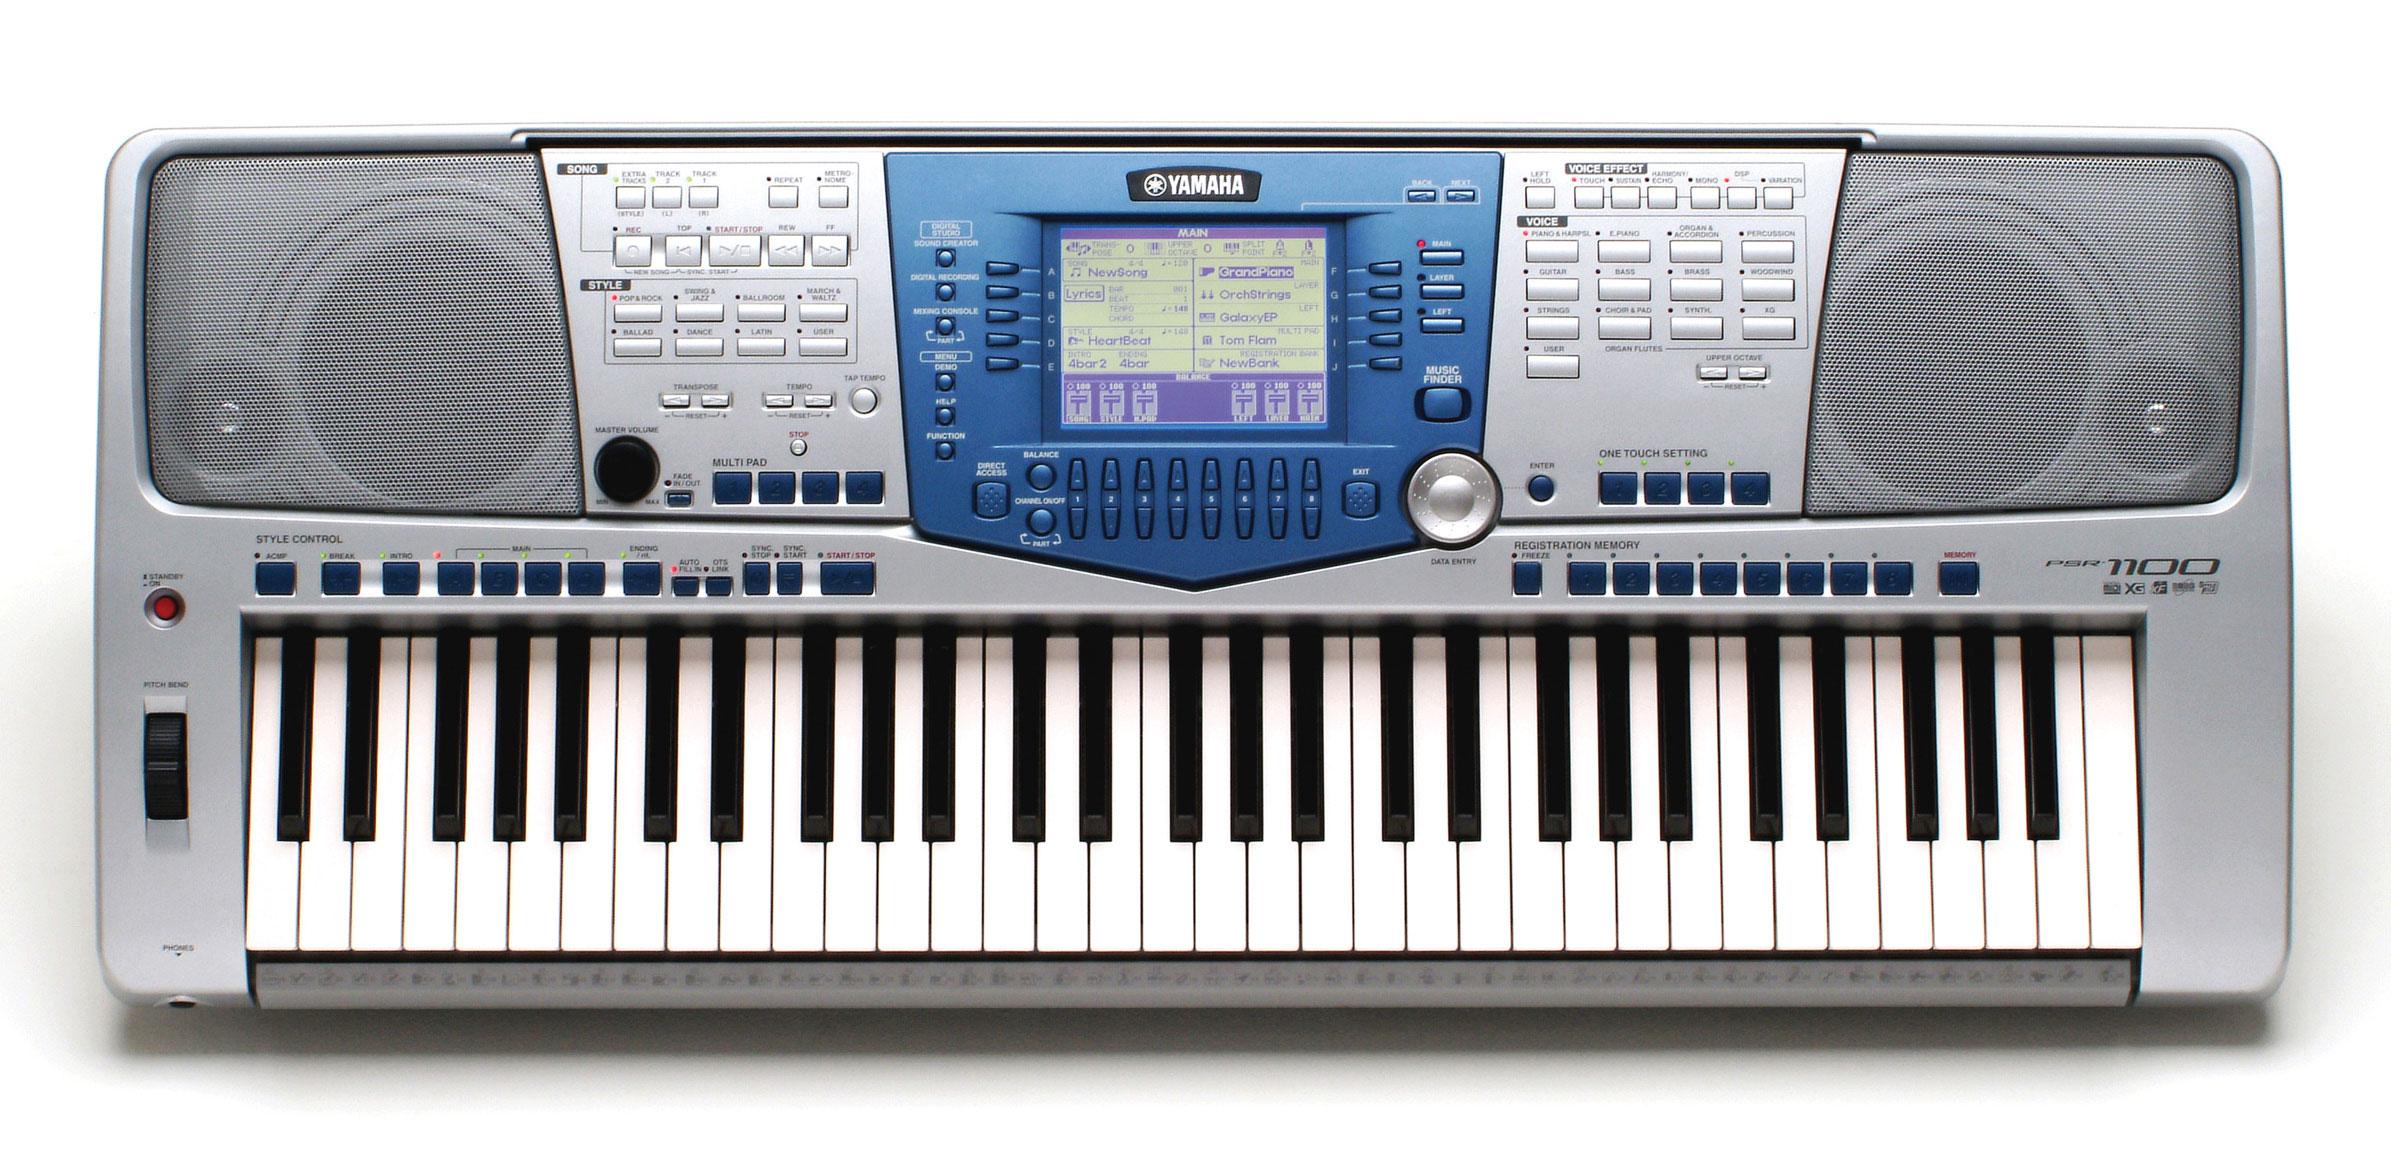 How To Play Midi Files On Yamaha Keyboard